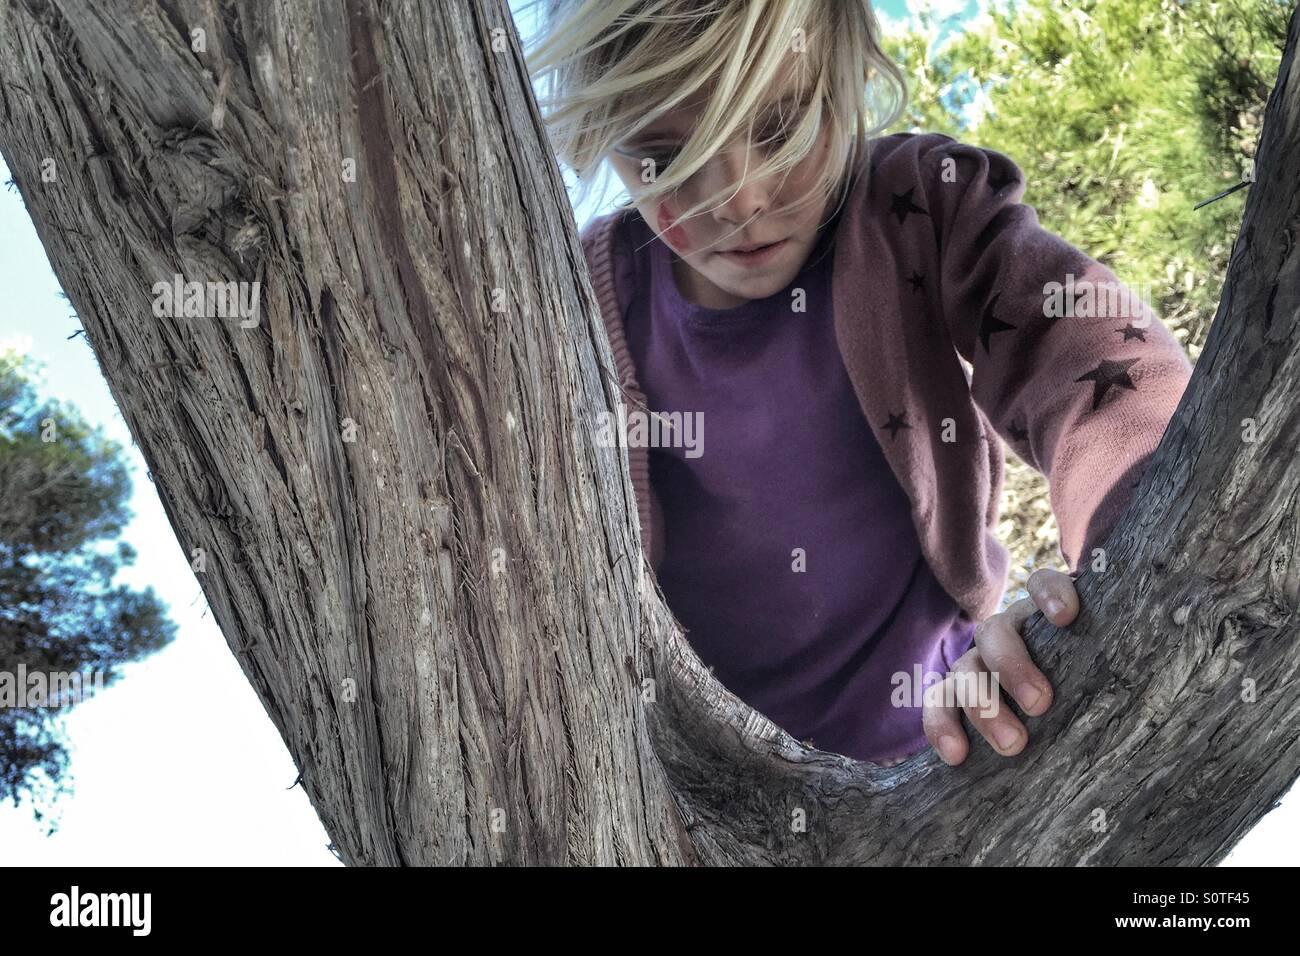 Girl climbing a tree - Stock Image